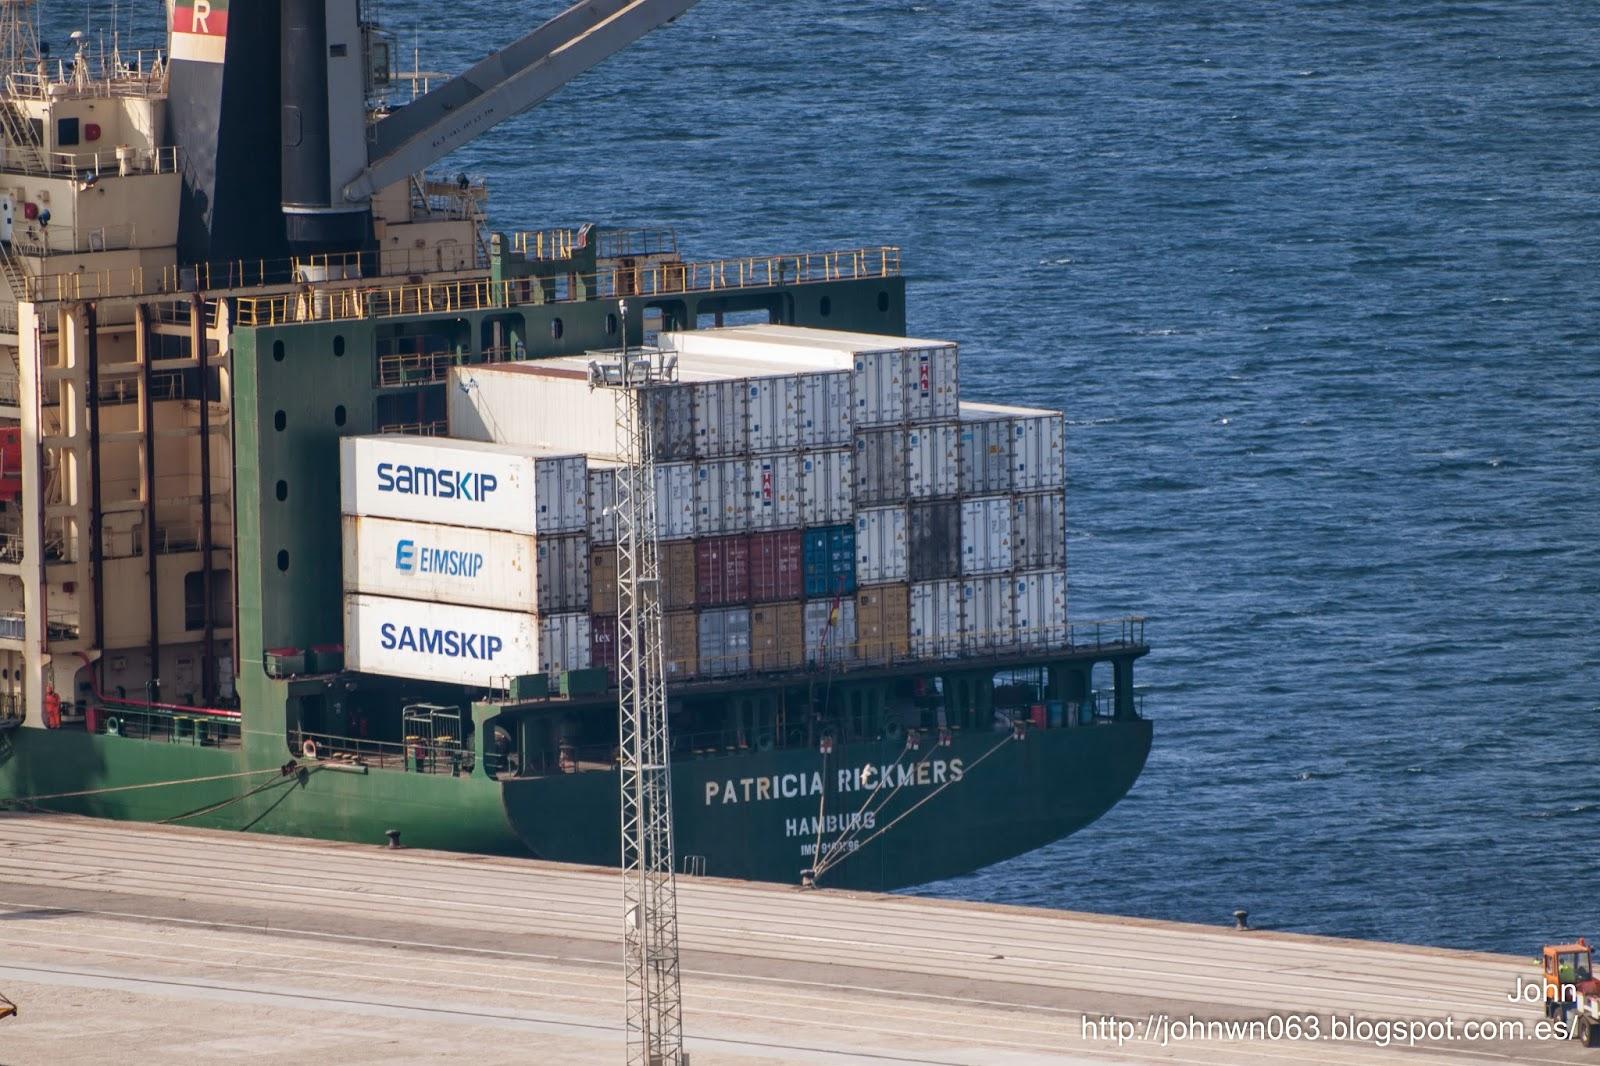 fotos de barcos, container ship, patricia rickmers, rickmers group, imagenes de barcos